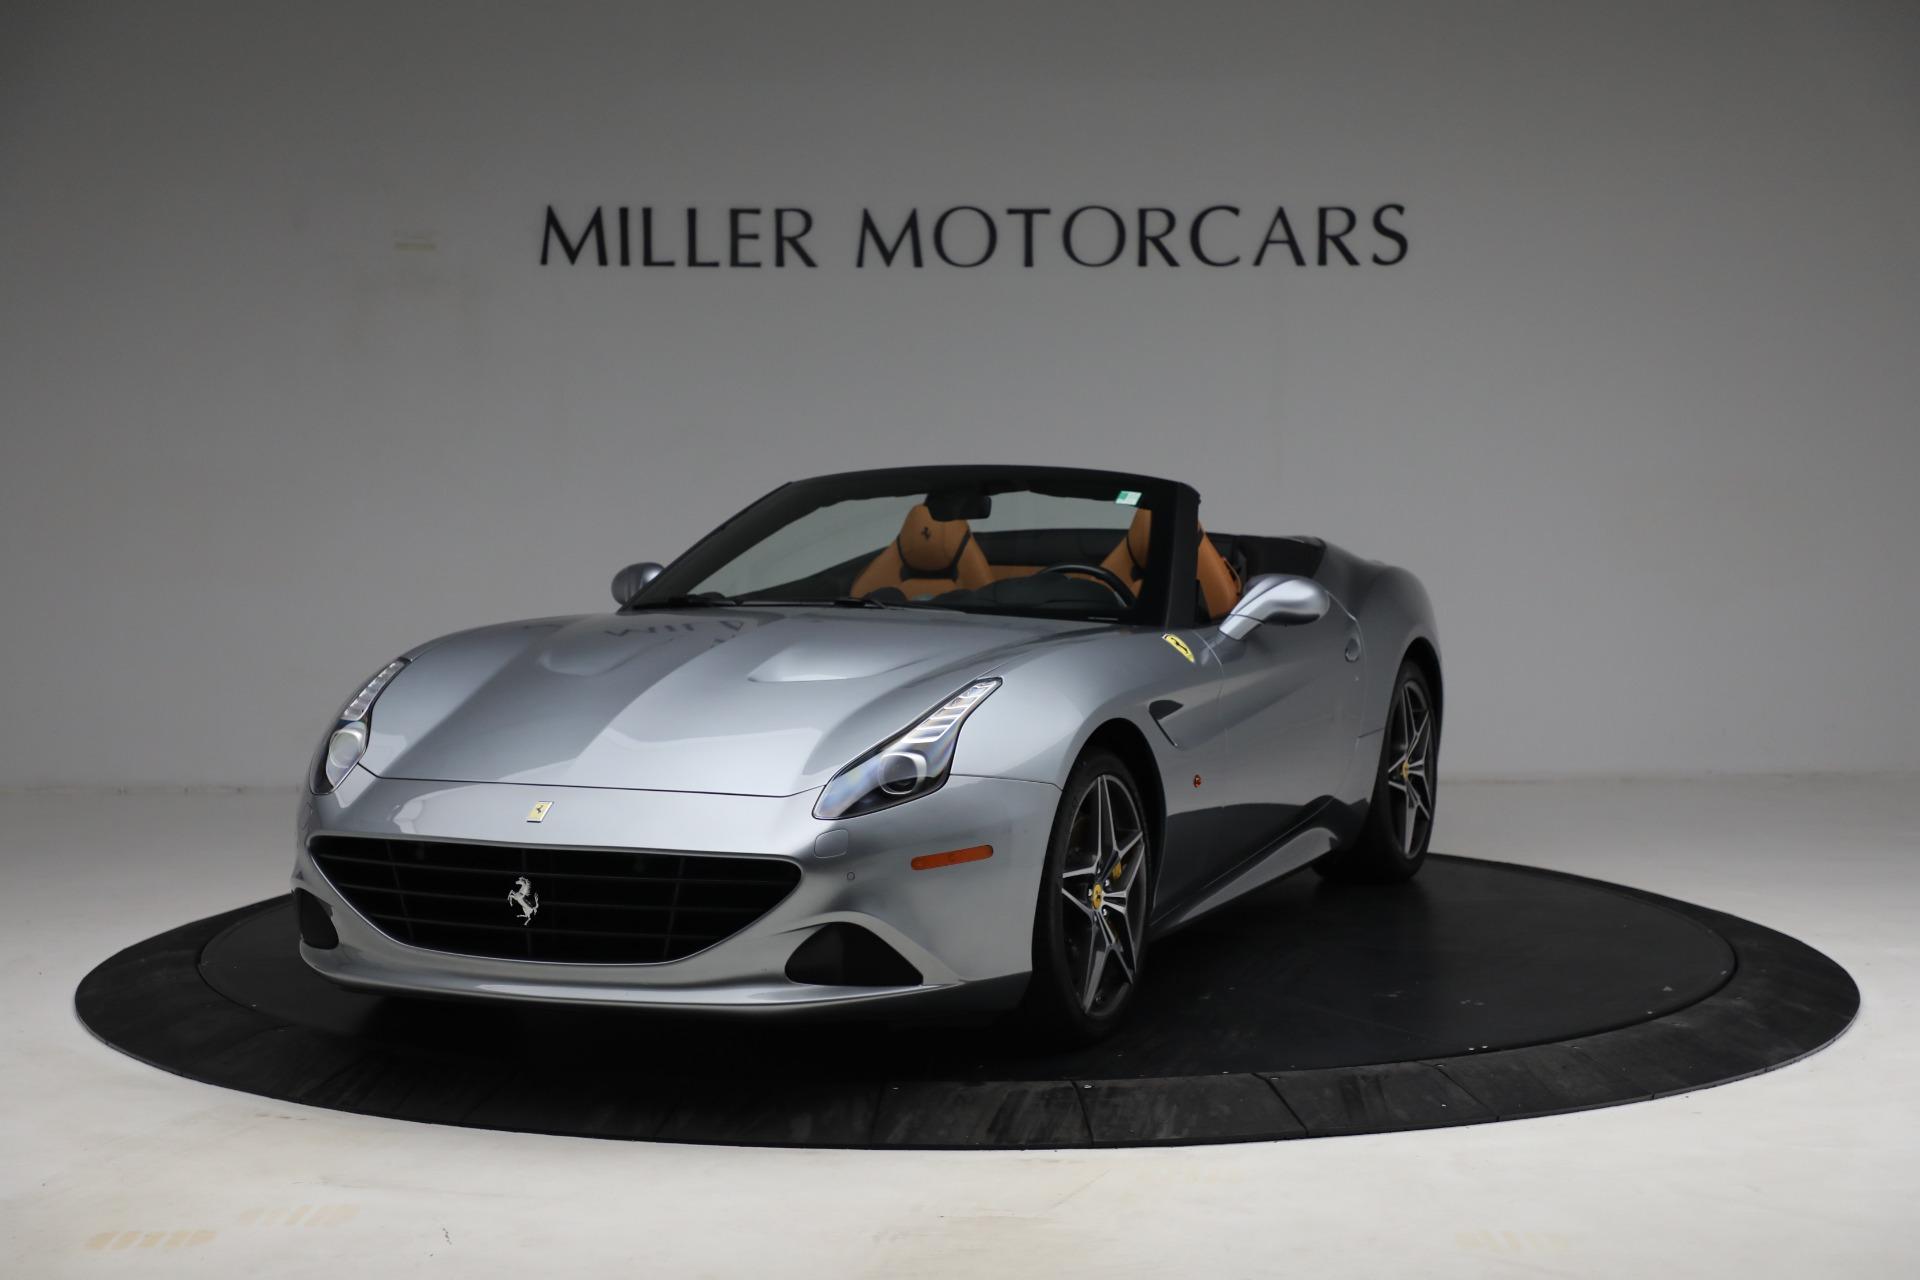 Used 2017 Ferrari California T for sale Sold at Alfa Romeo of Greenwich in Greenwich CT 06830 1